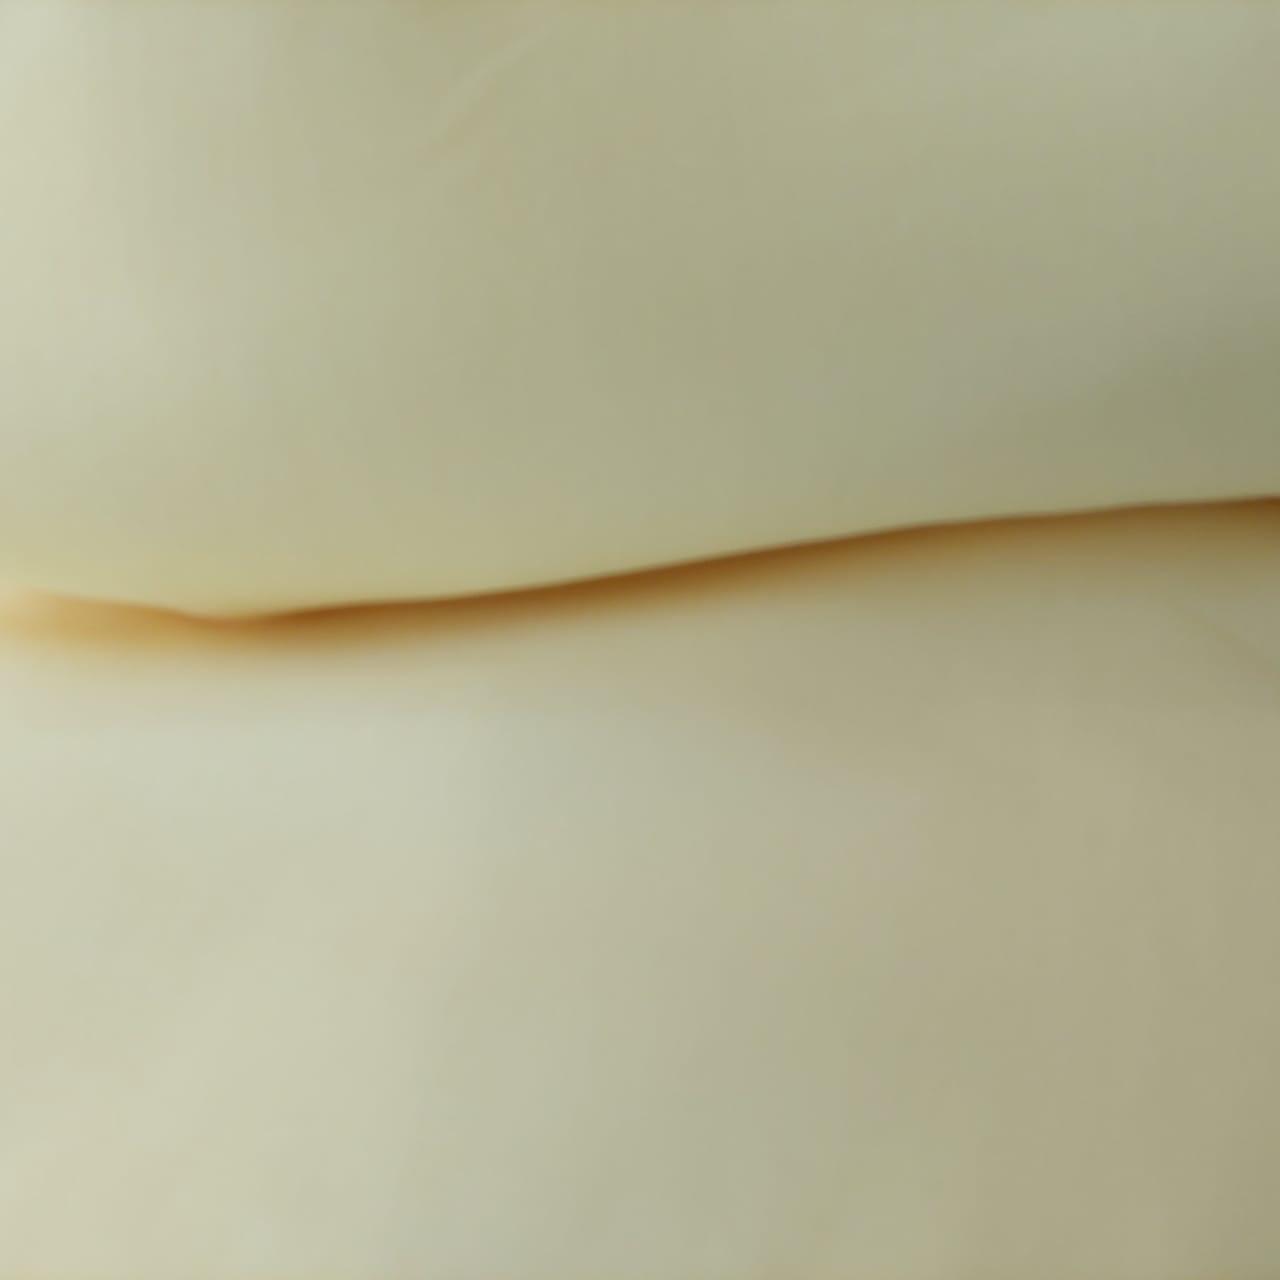 Tecido tricoline liso - cor amarelo bebê - 2,20 cm  largura - Fernando Maluhy